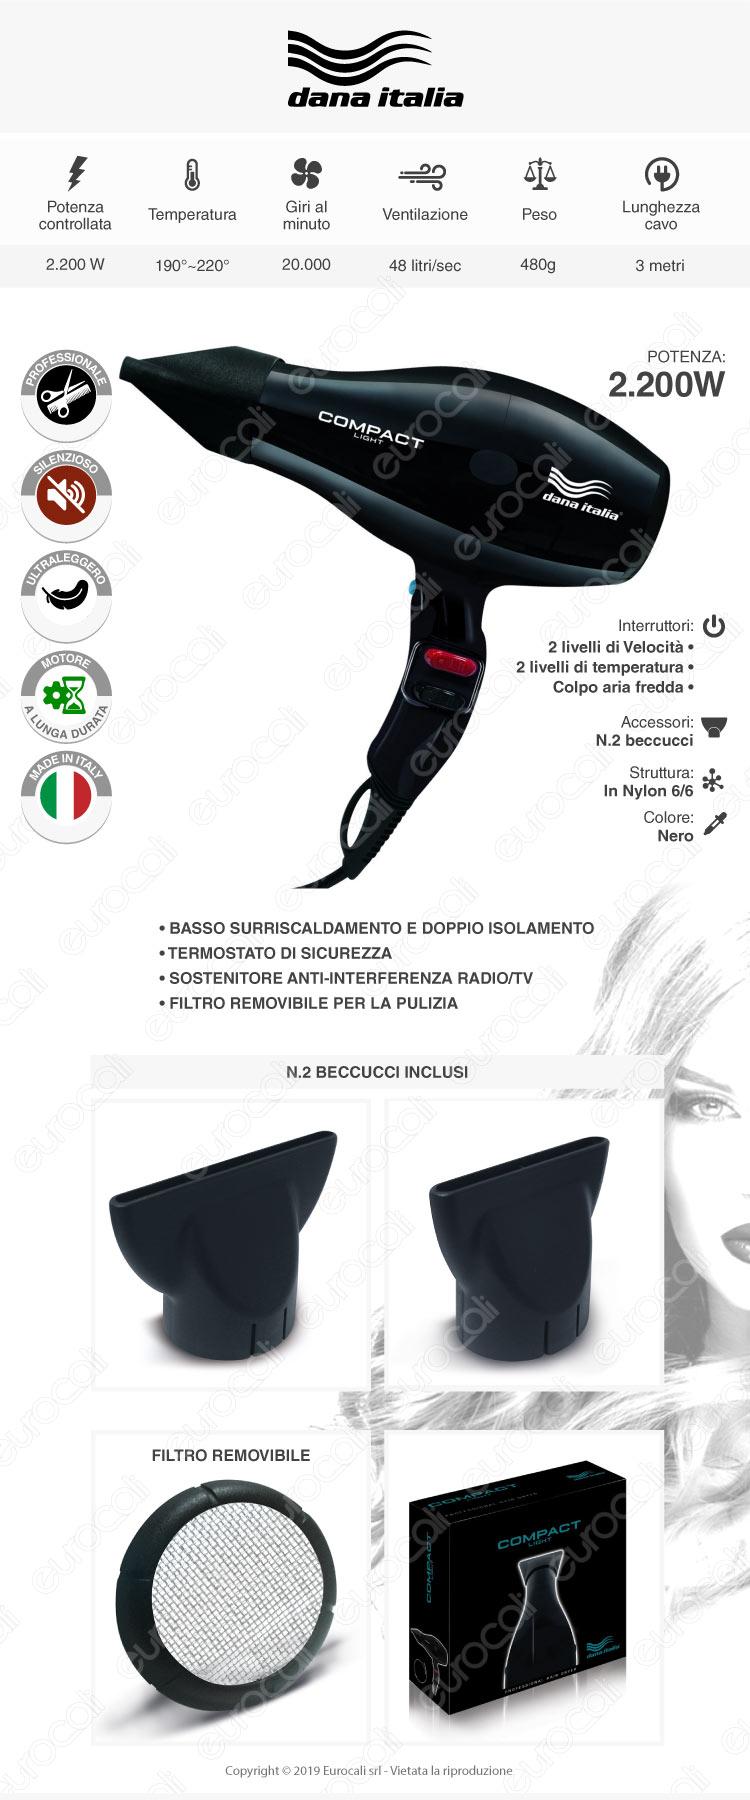 Dana Italia Asciugacapelli Professionale